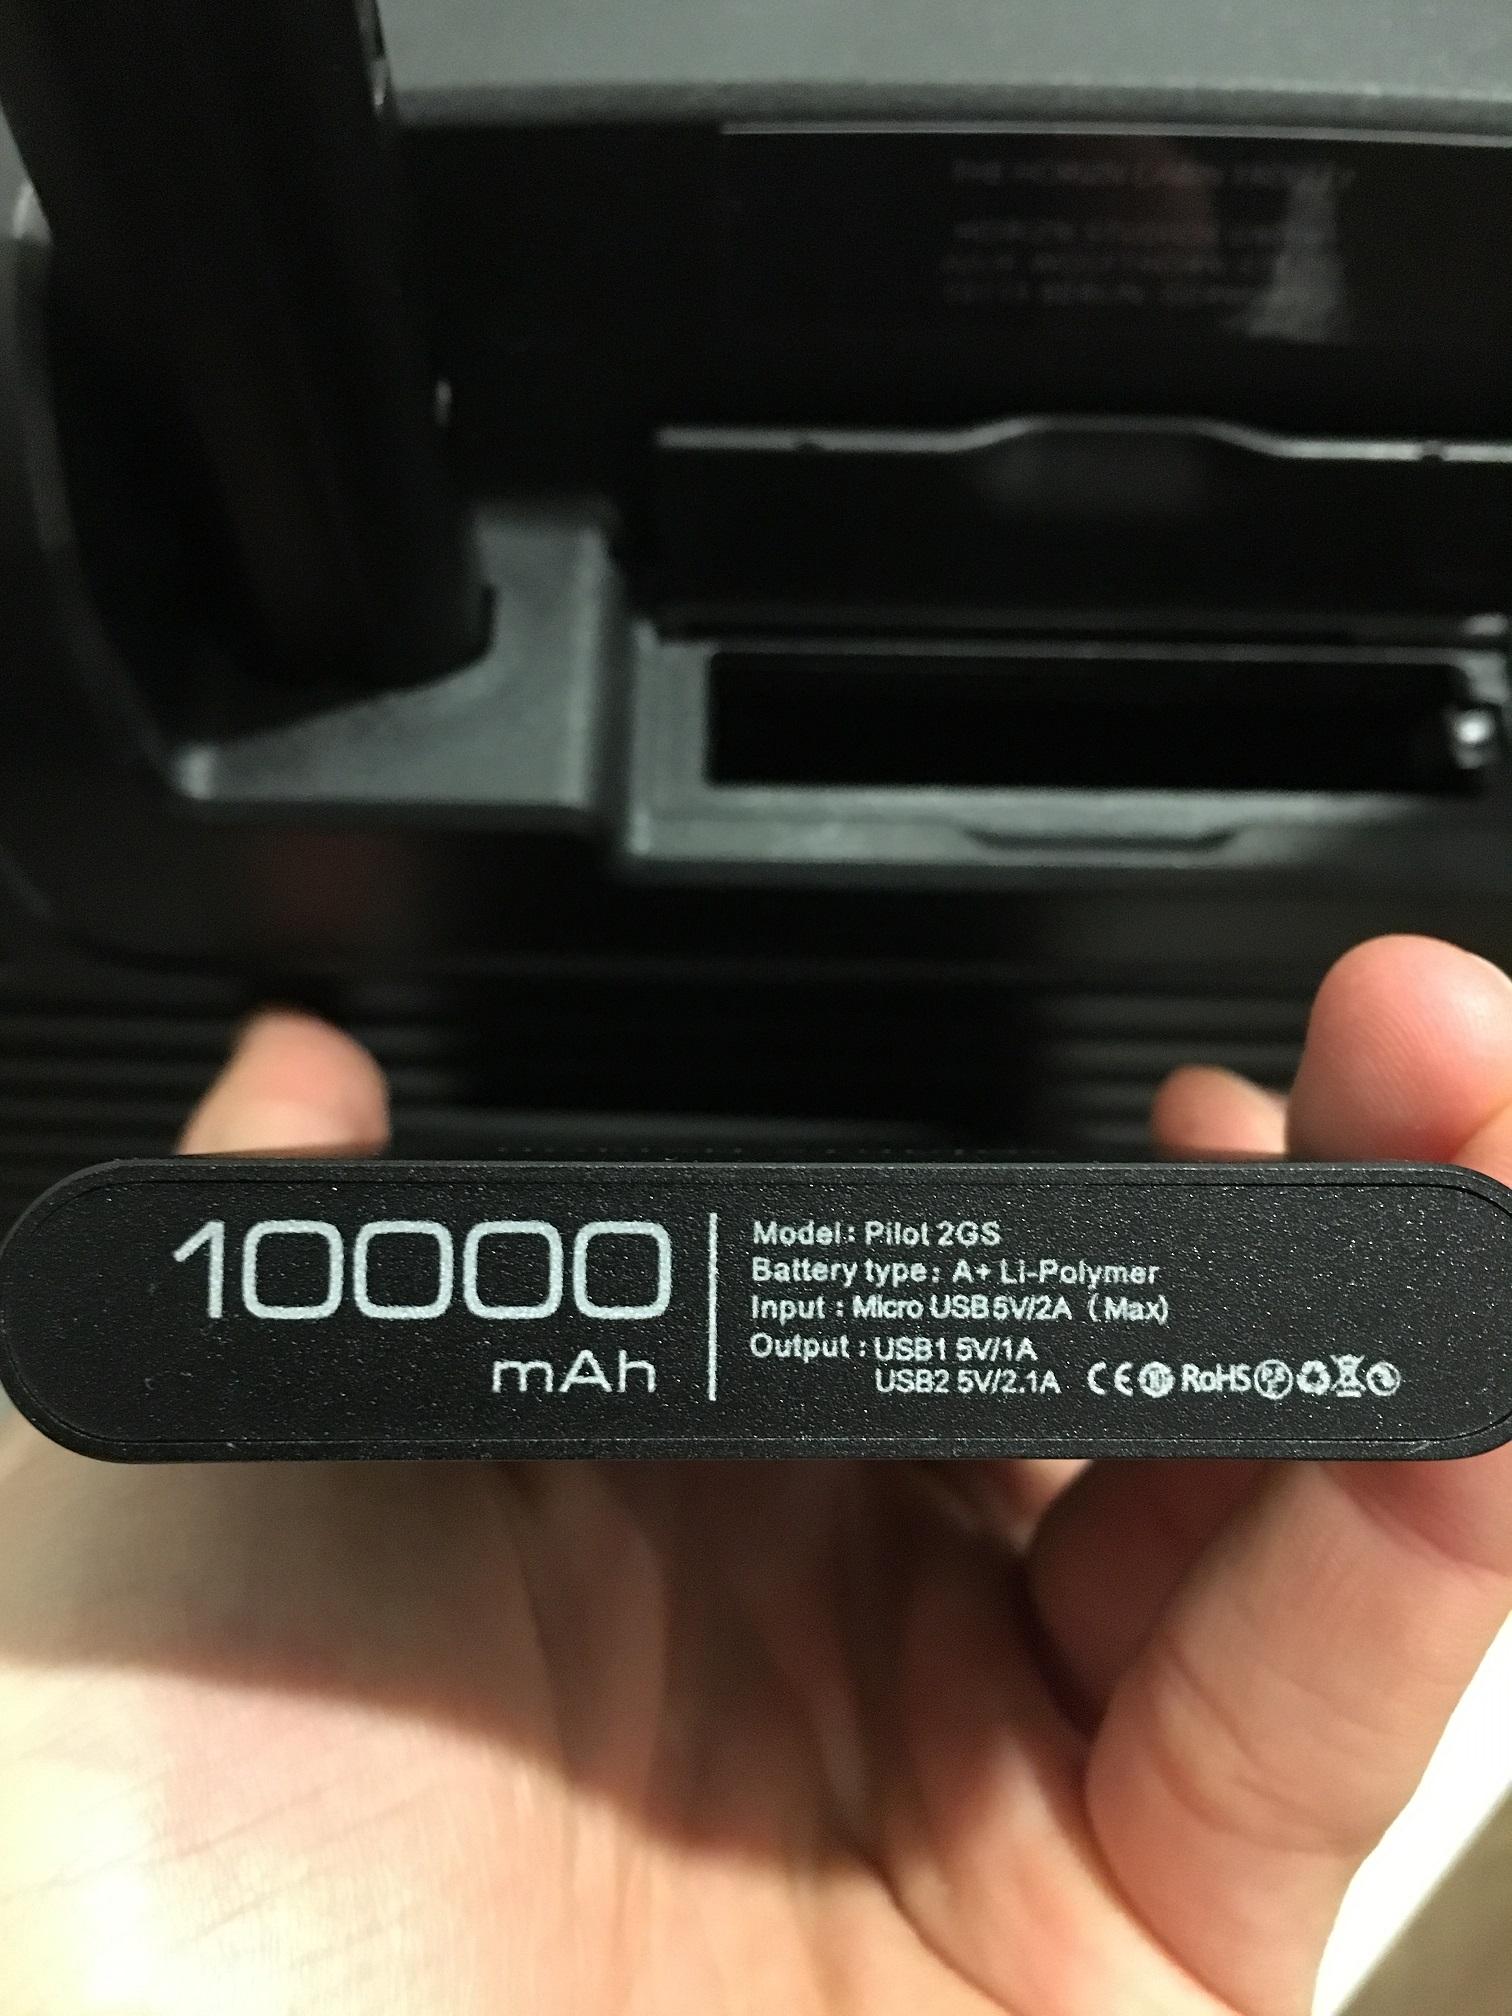 12842858-MkIvO.jpg